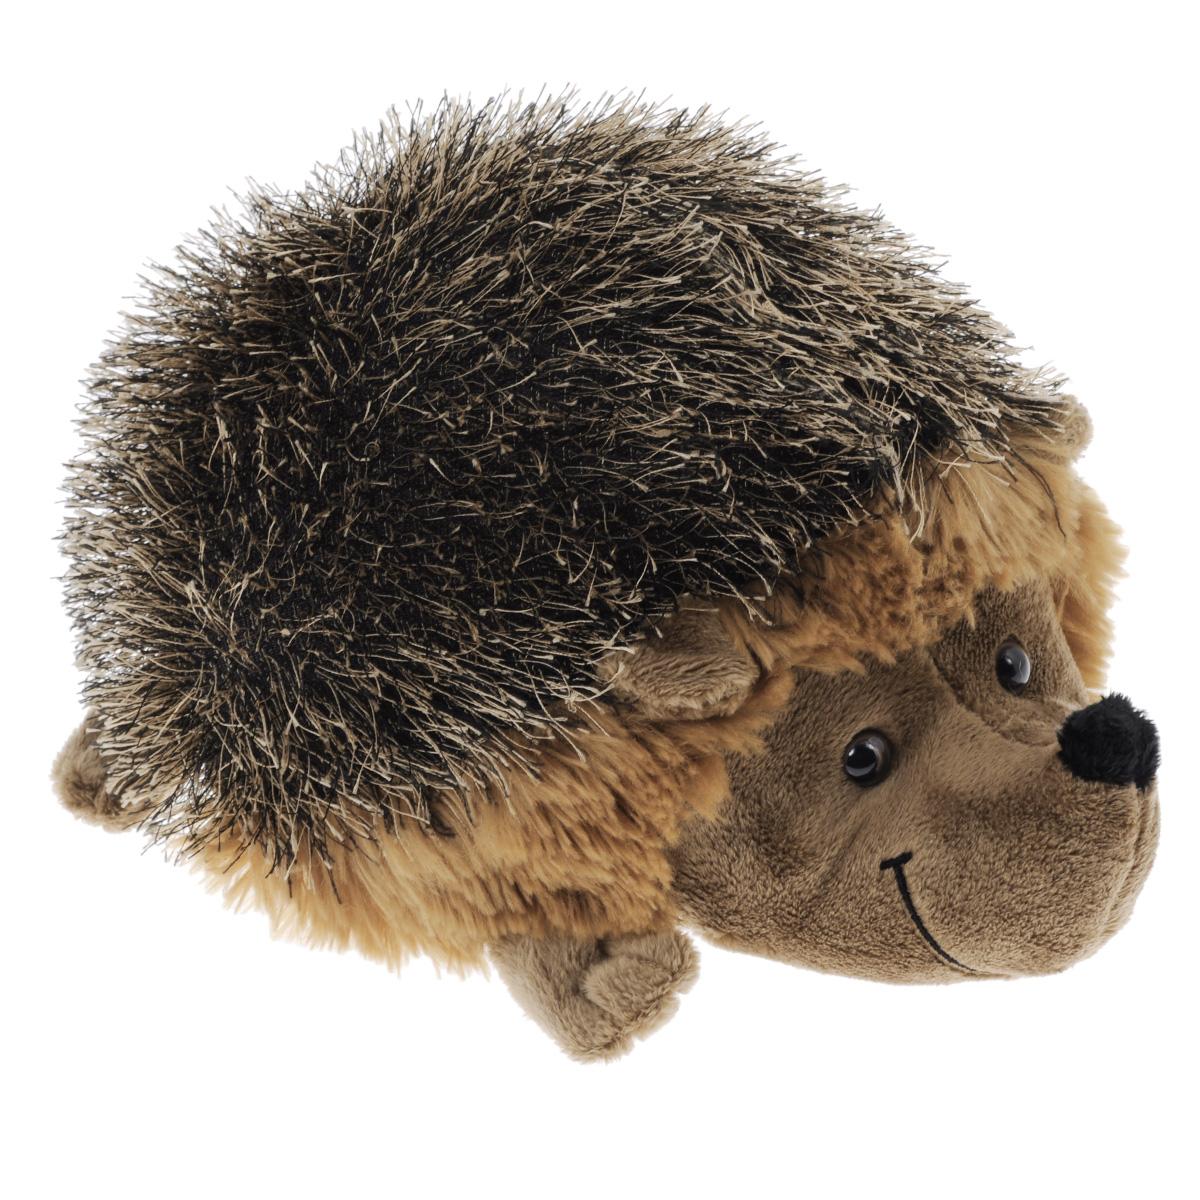 Мягкая игрушка Gulliver Ежик Уф-уф, 24 см gulliver ежик сидячий 17 см gulliver